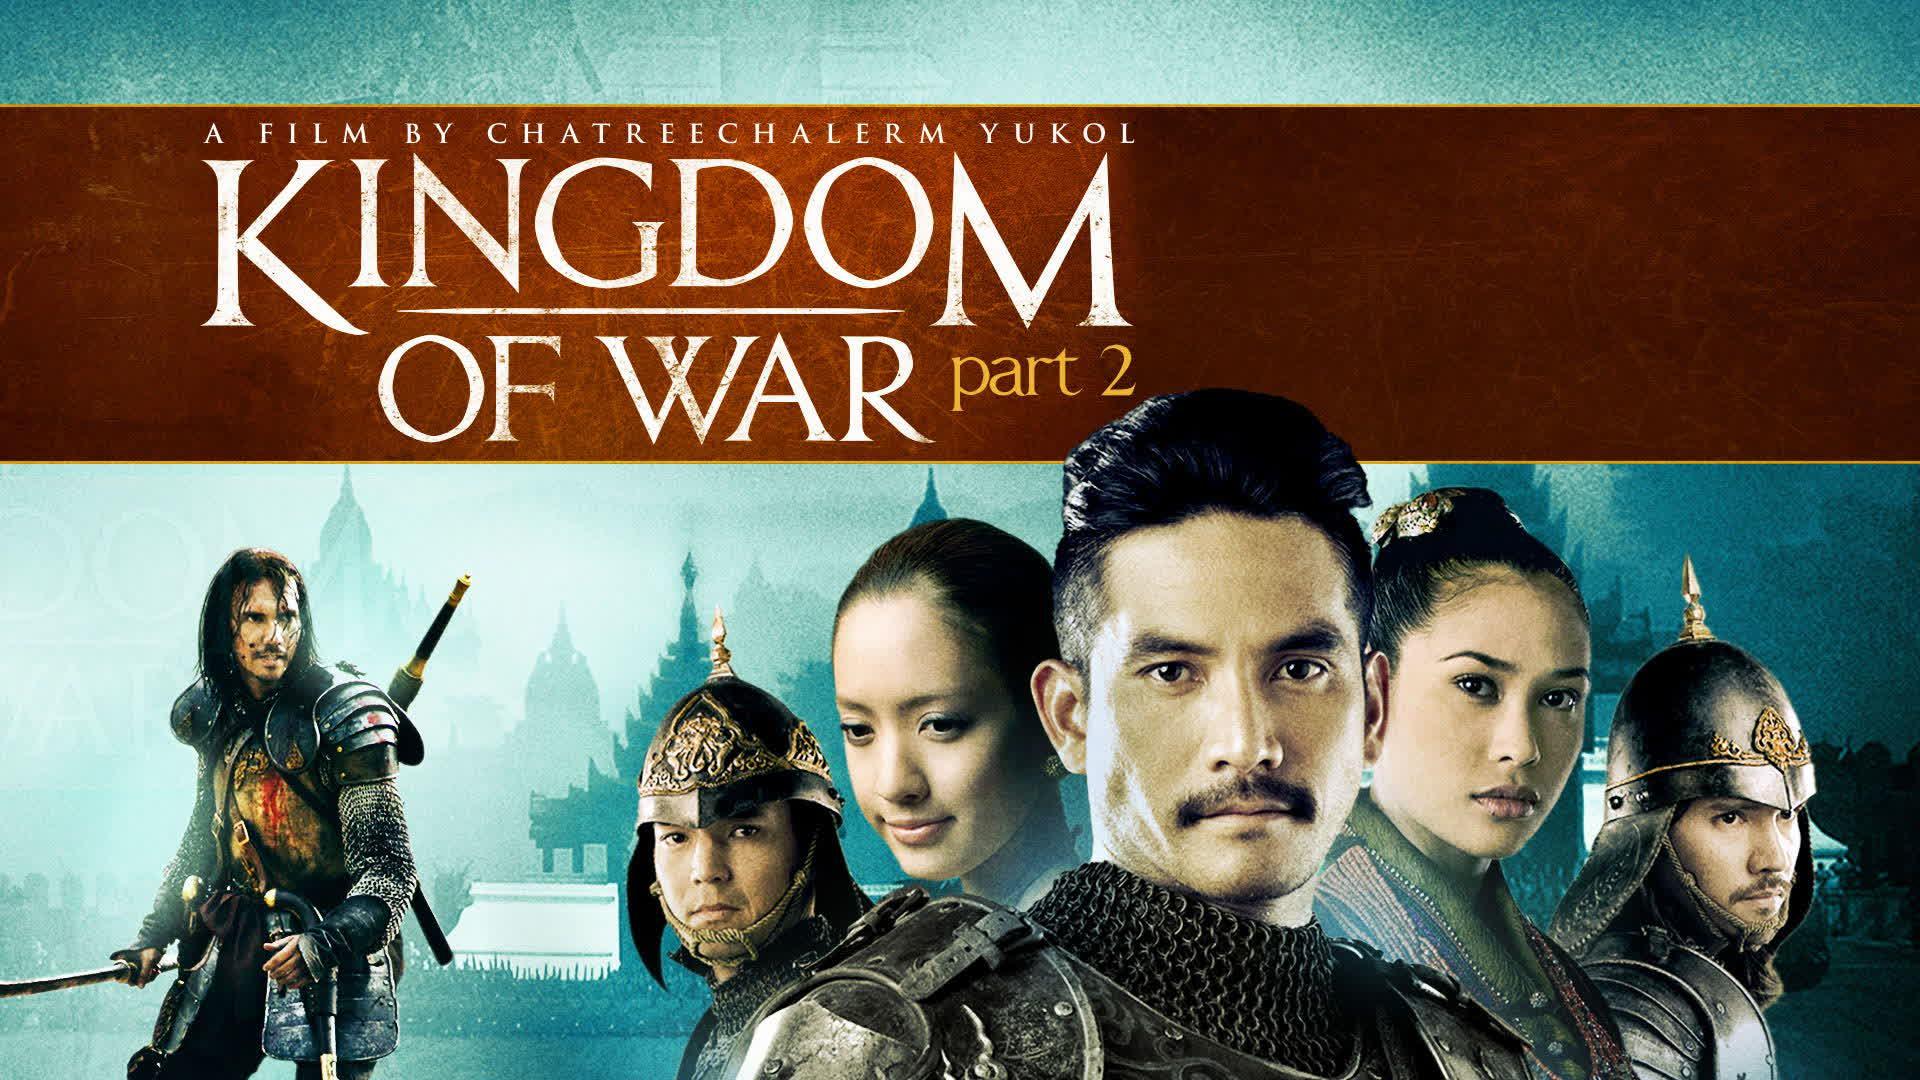 Kingdom of War, Part 2